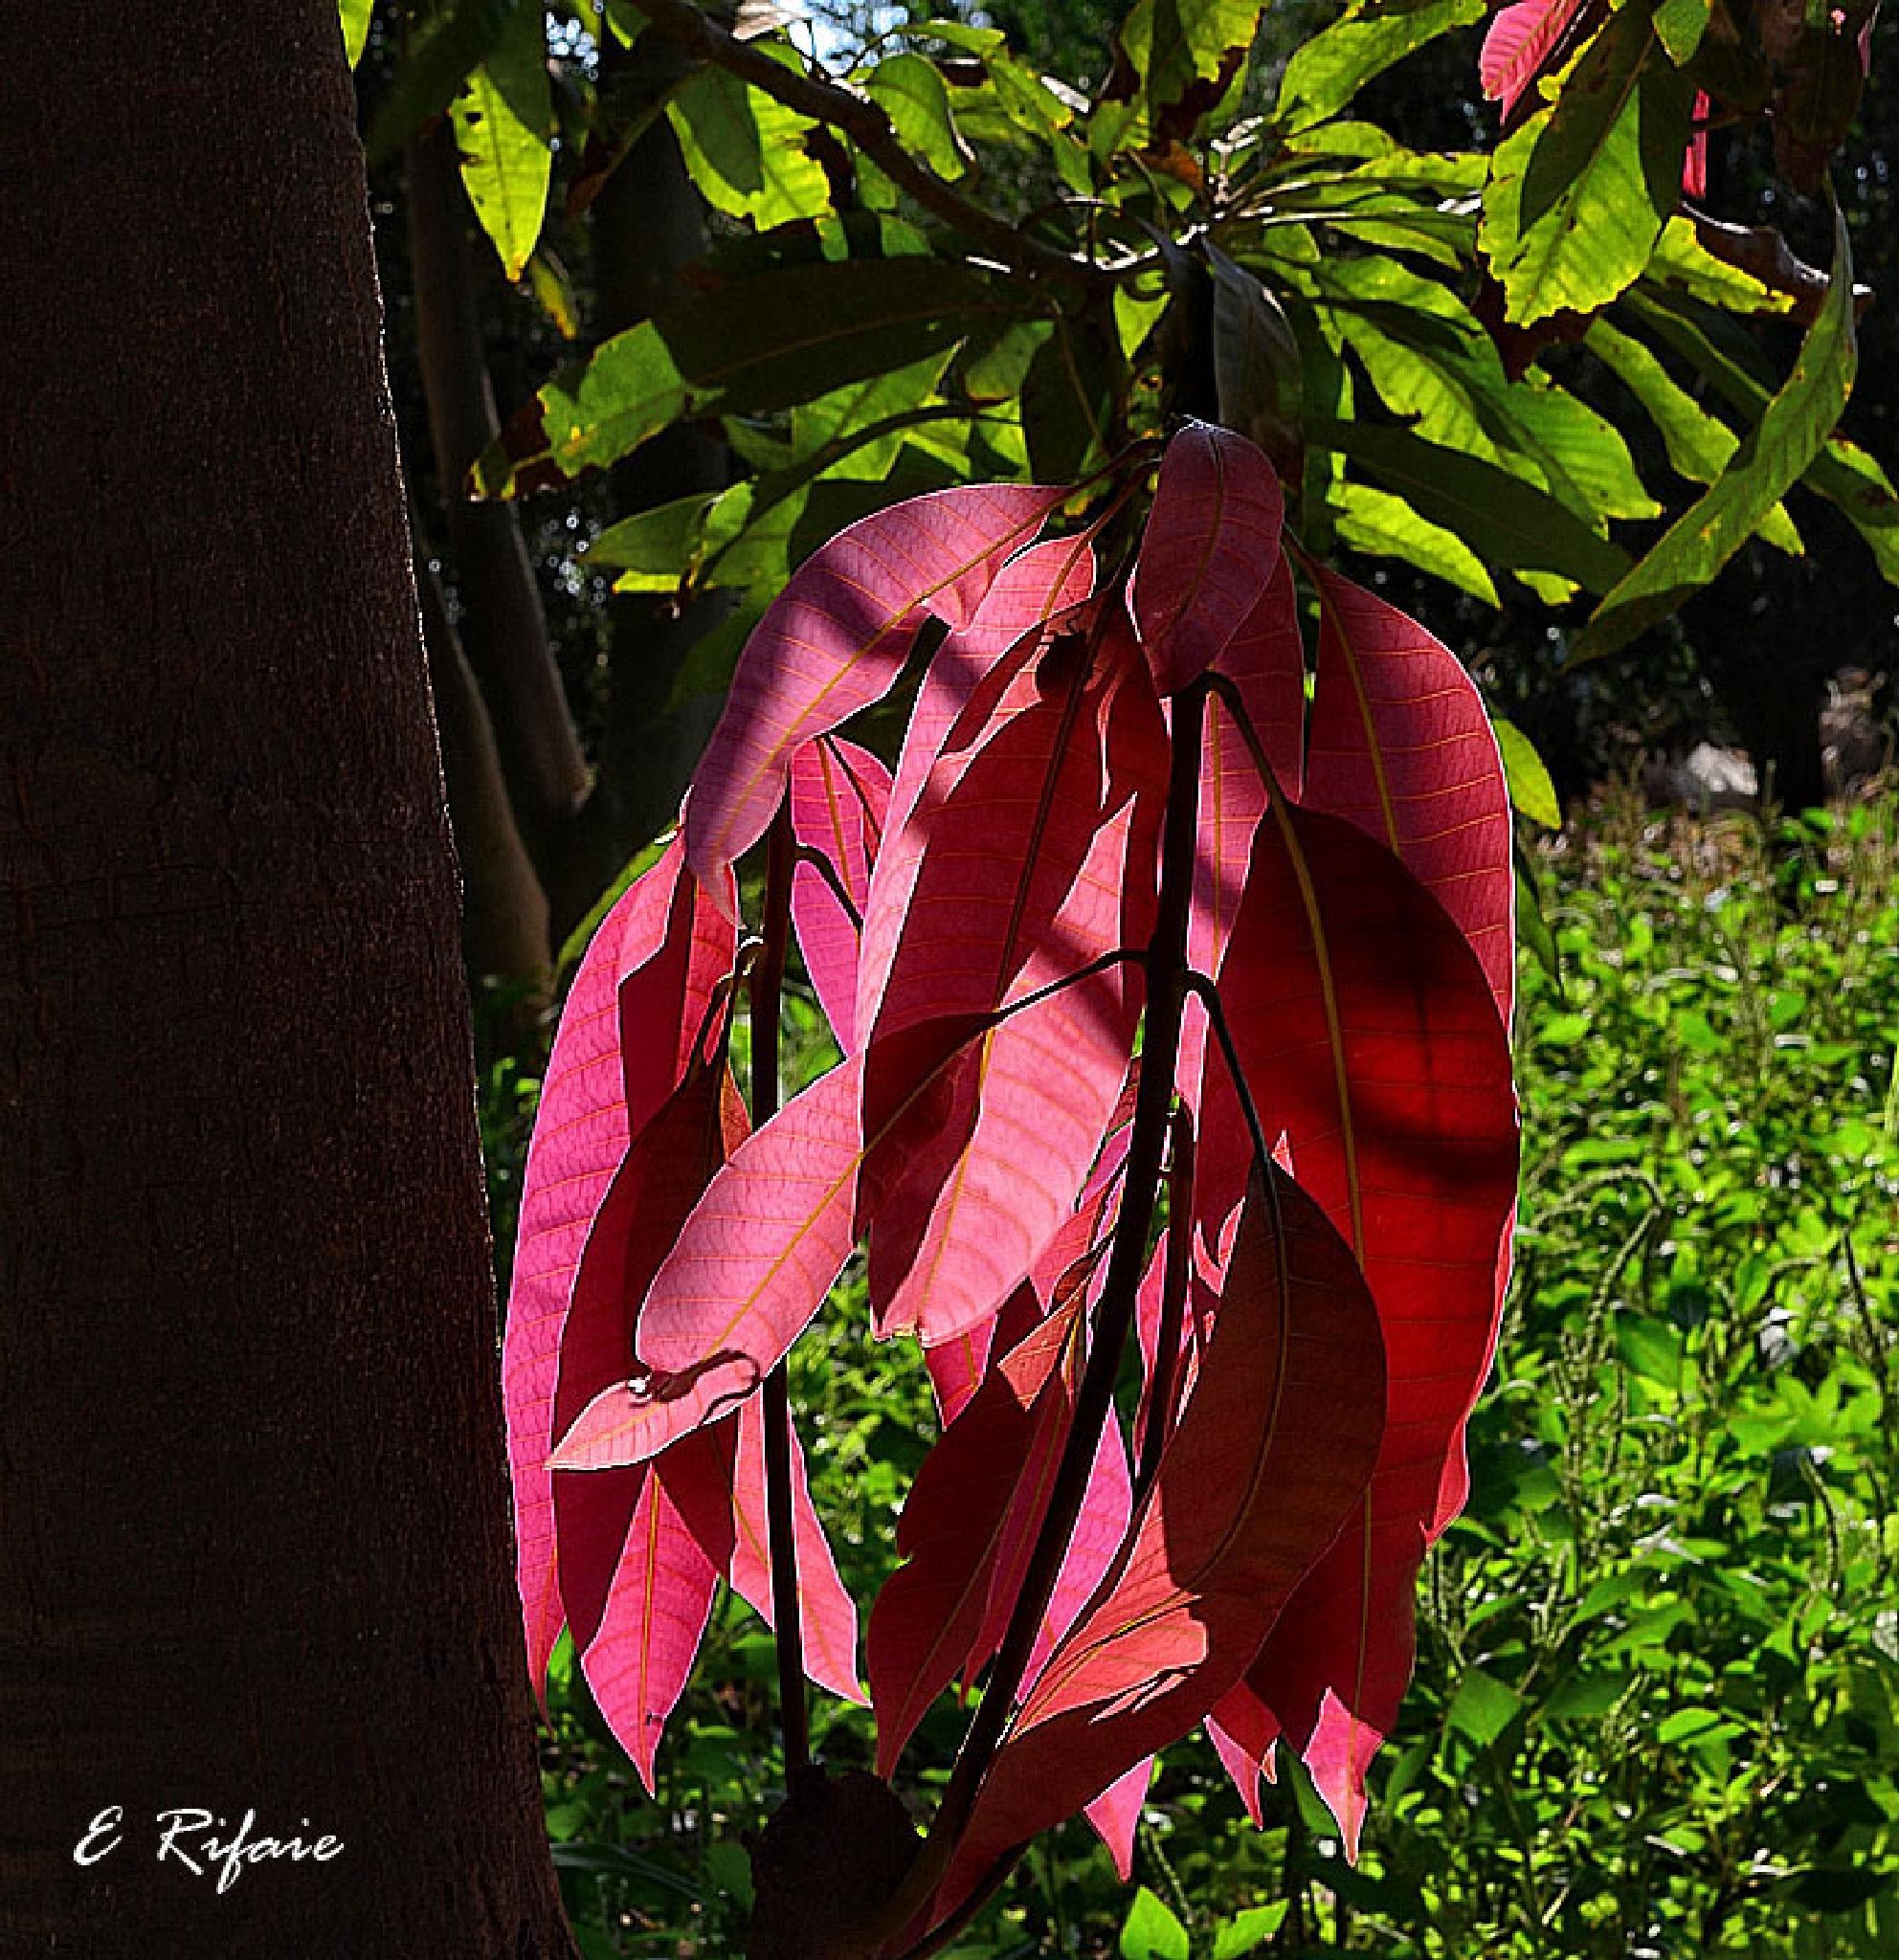 Mango leaves by Emad Eldin Moustafa El Refaie